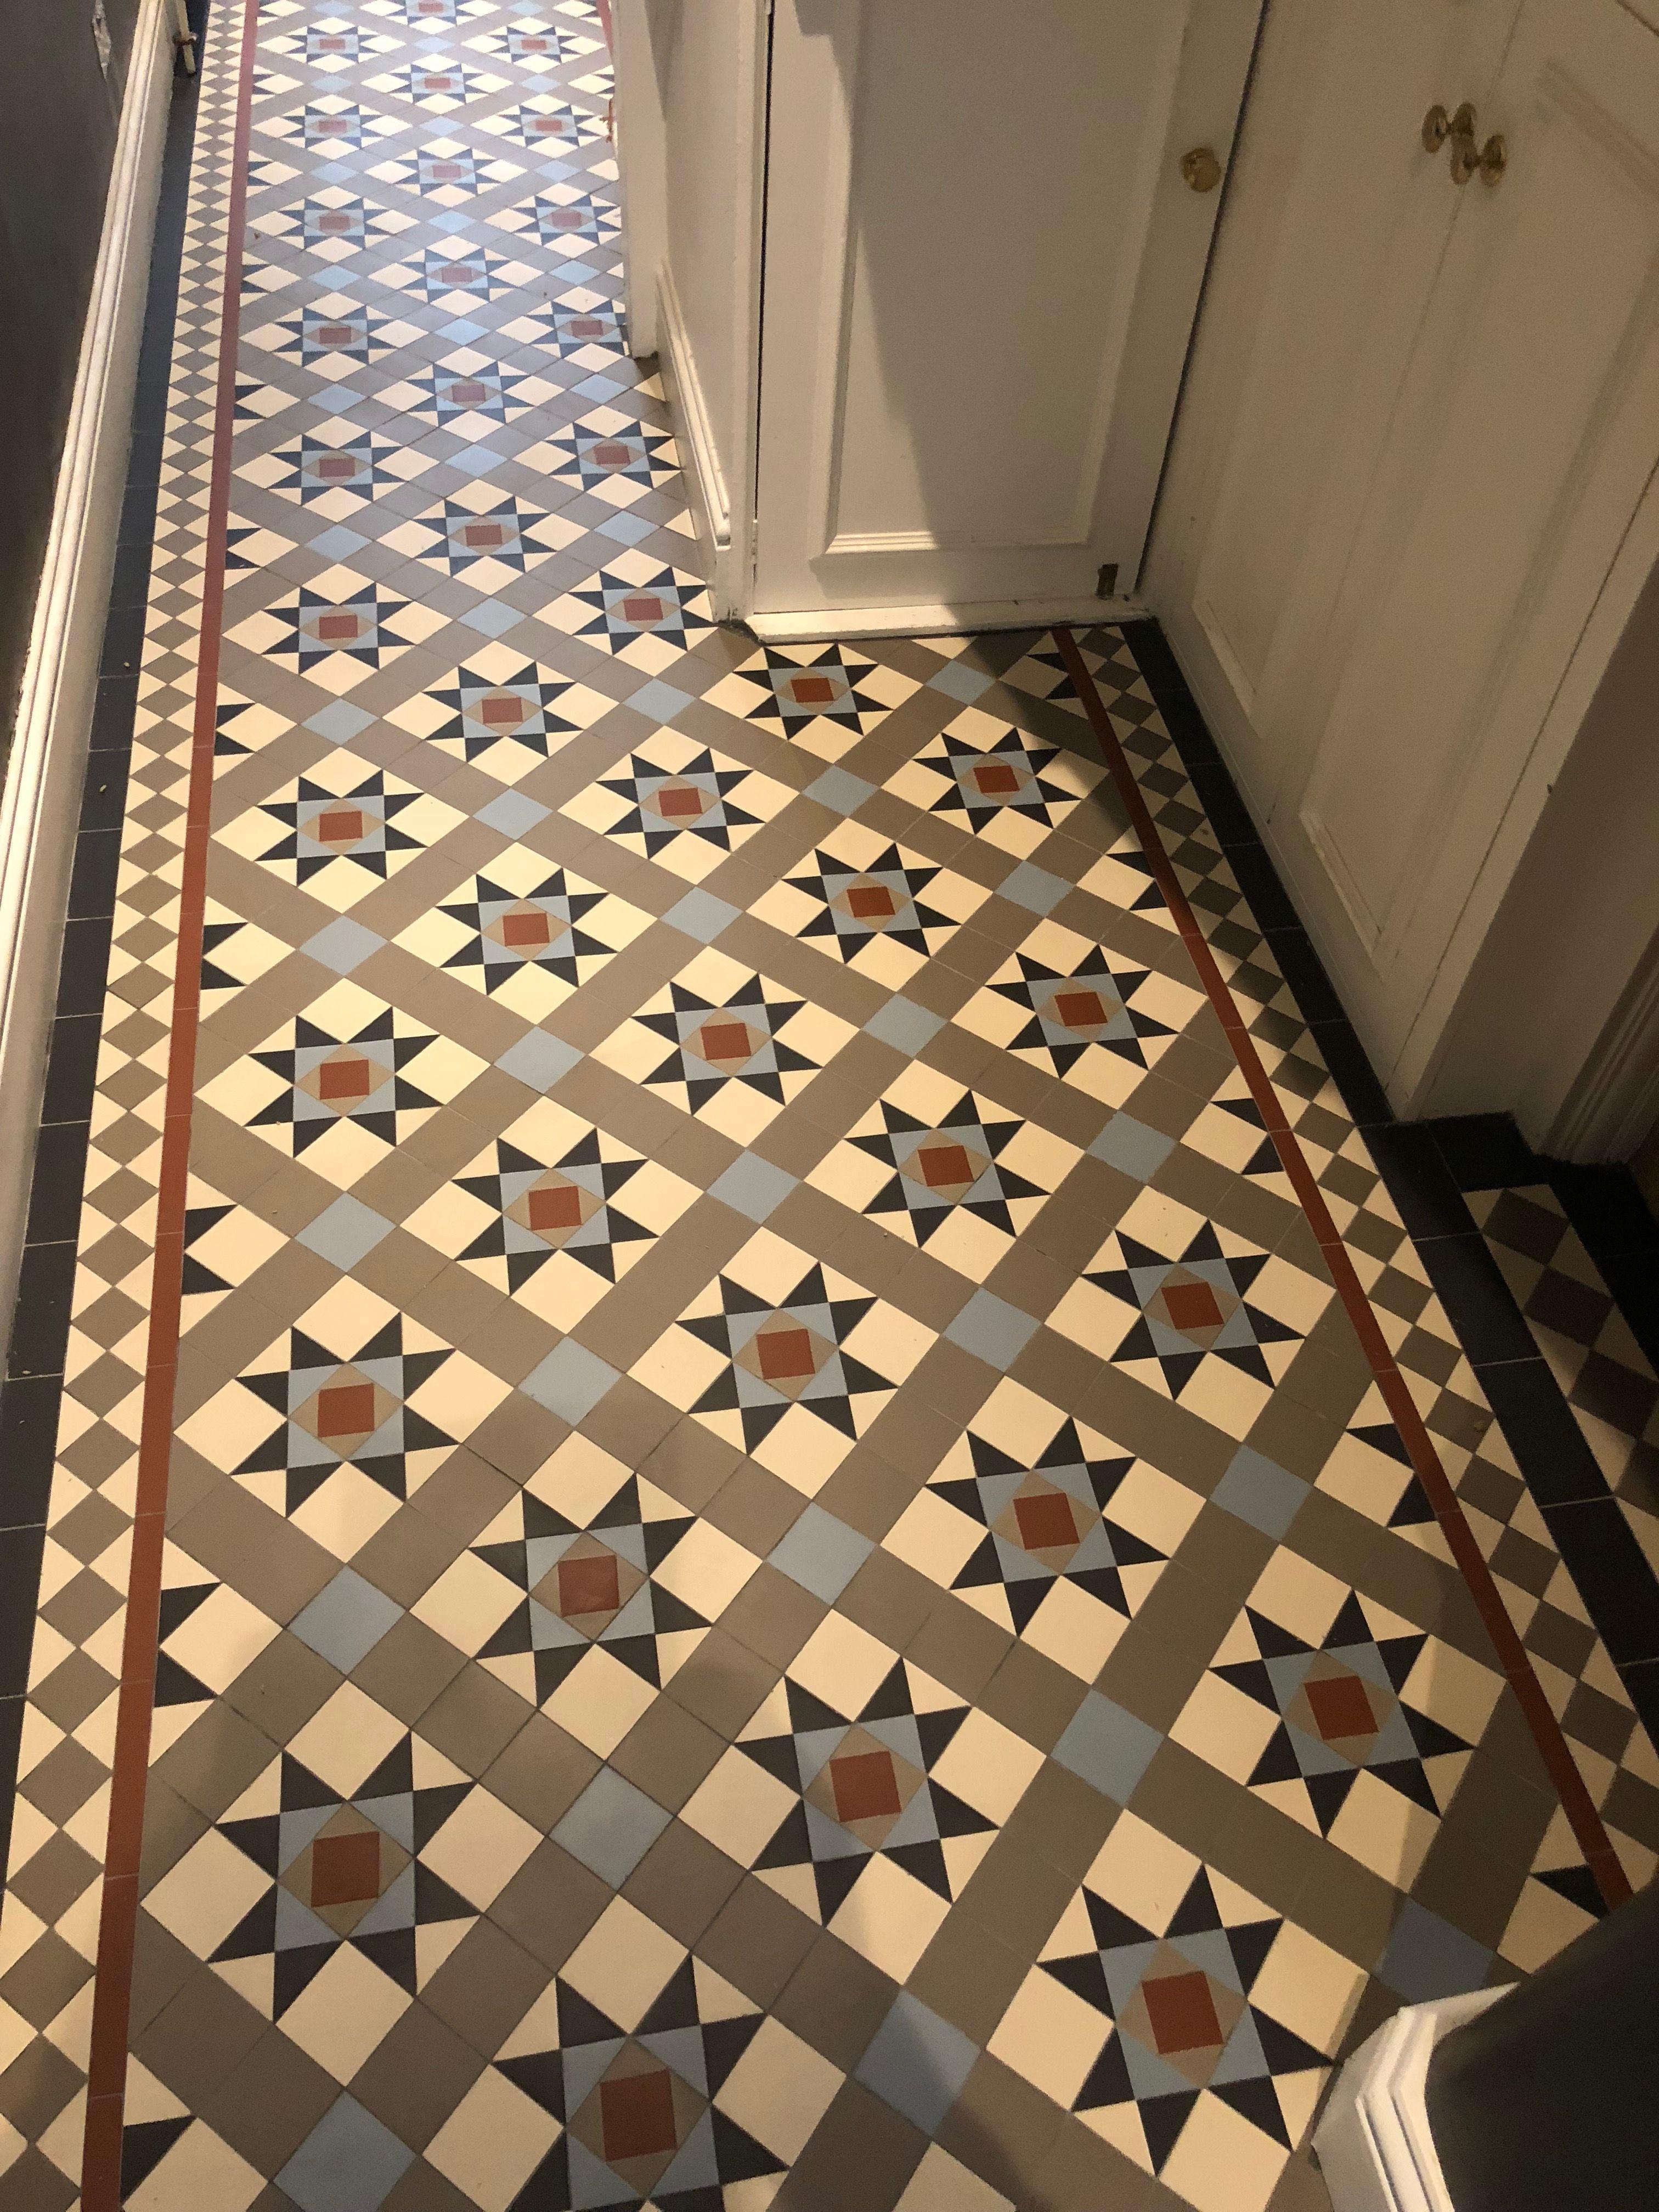 Victorian Mosaic Hallway Www Hicompany Co Uk Victorian Mosaic Tile Tiled Hallway Mosaic Tiles